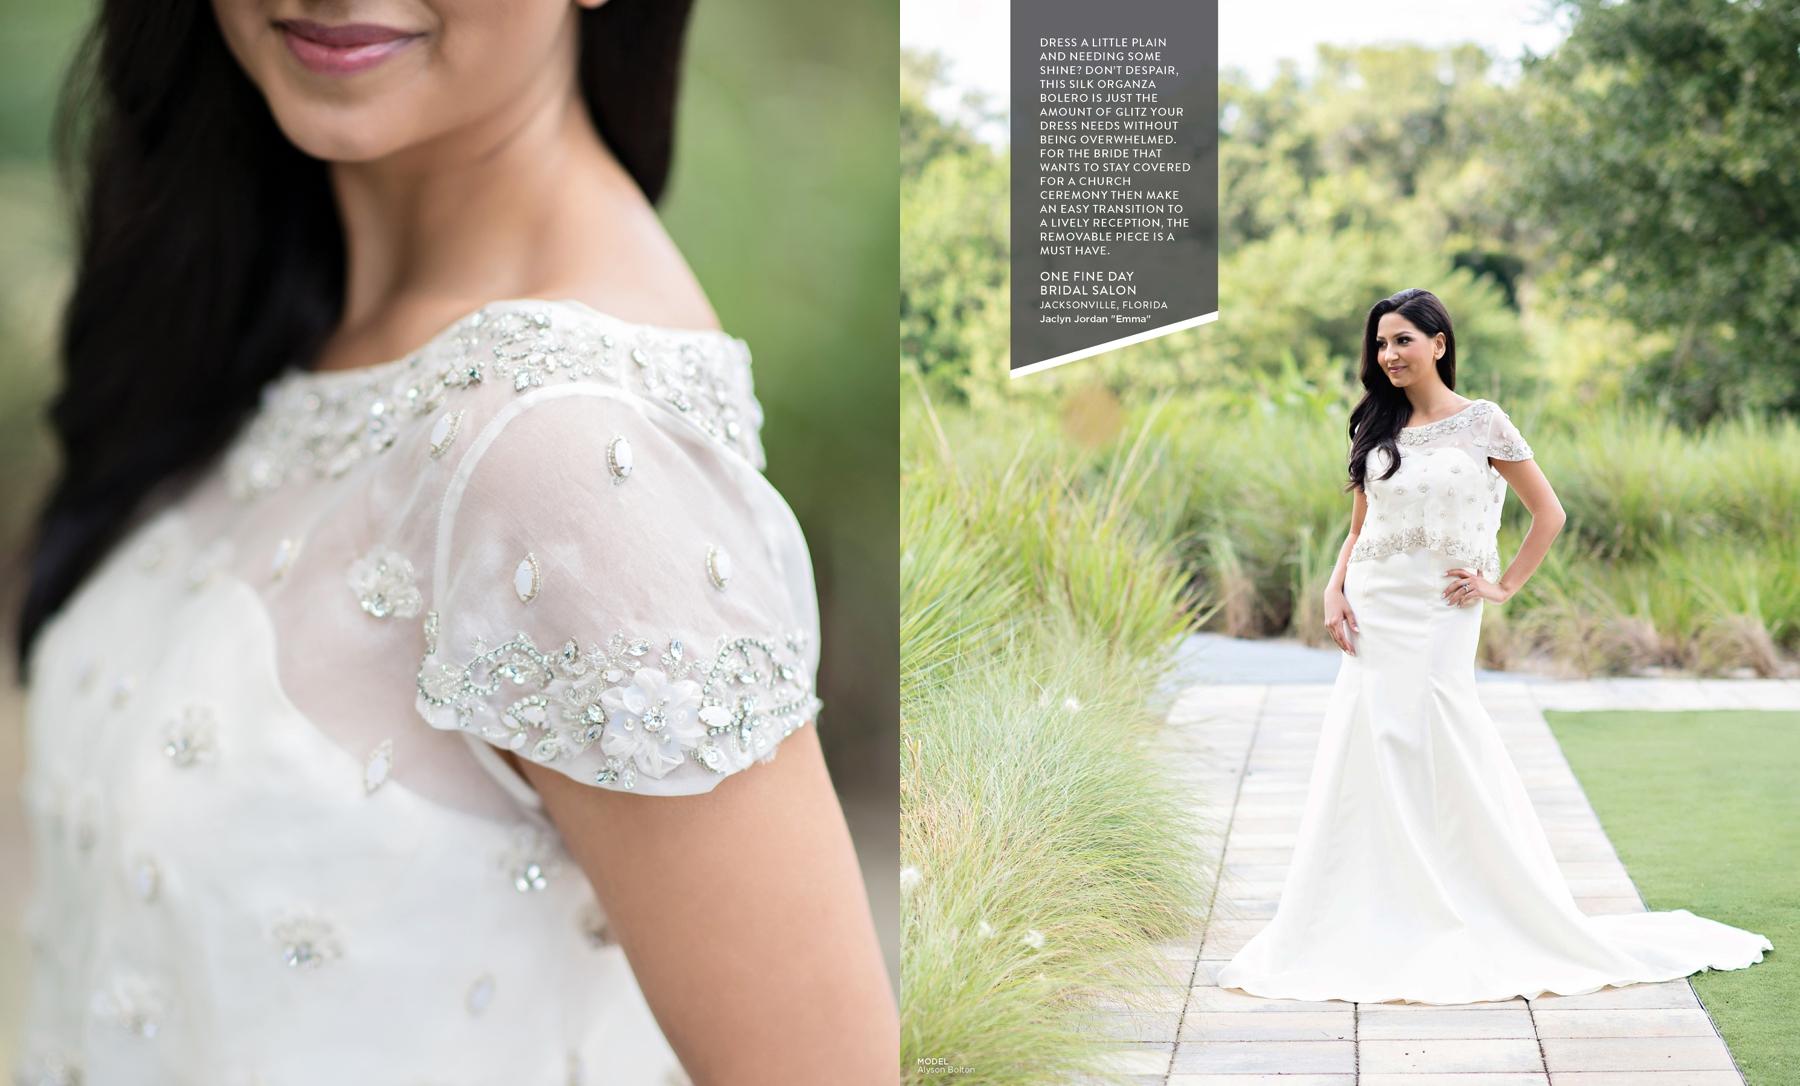 Jaclyn Jordan Emma wedding gown